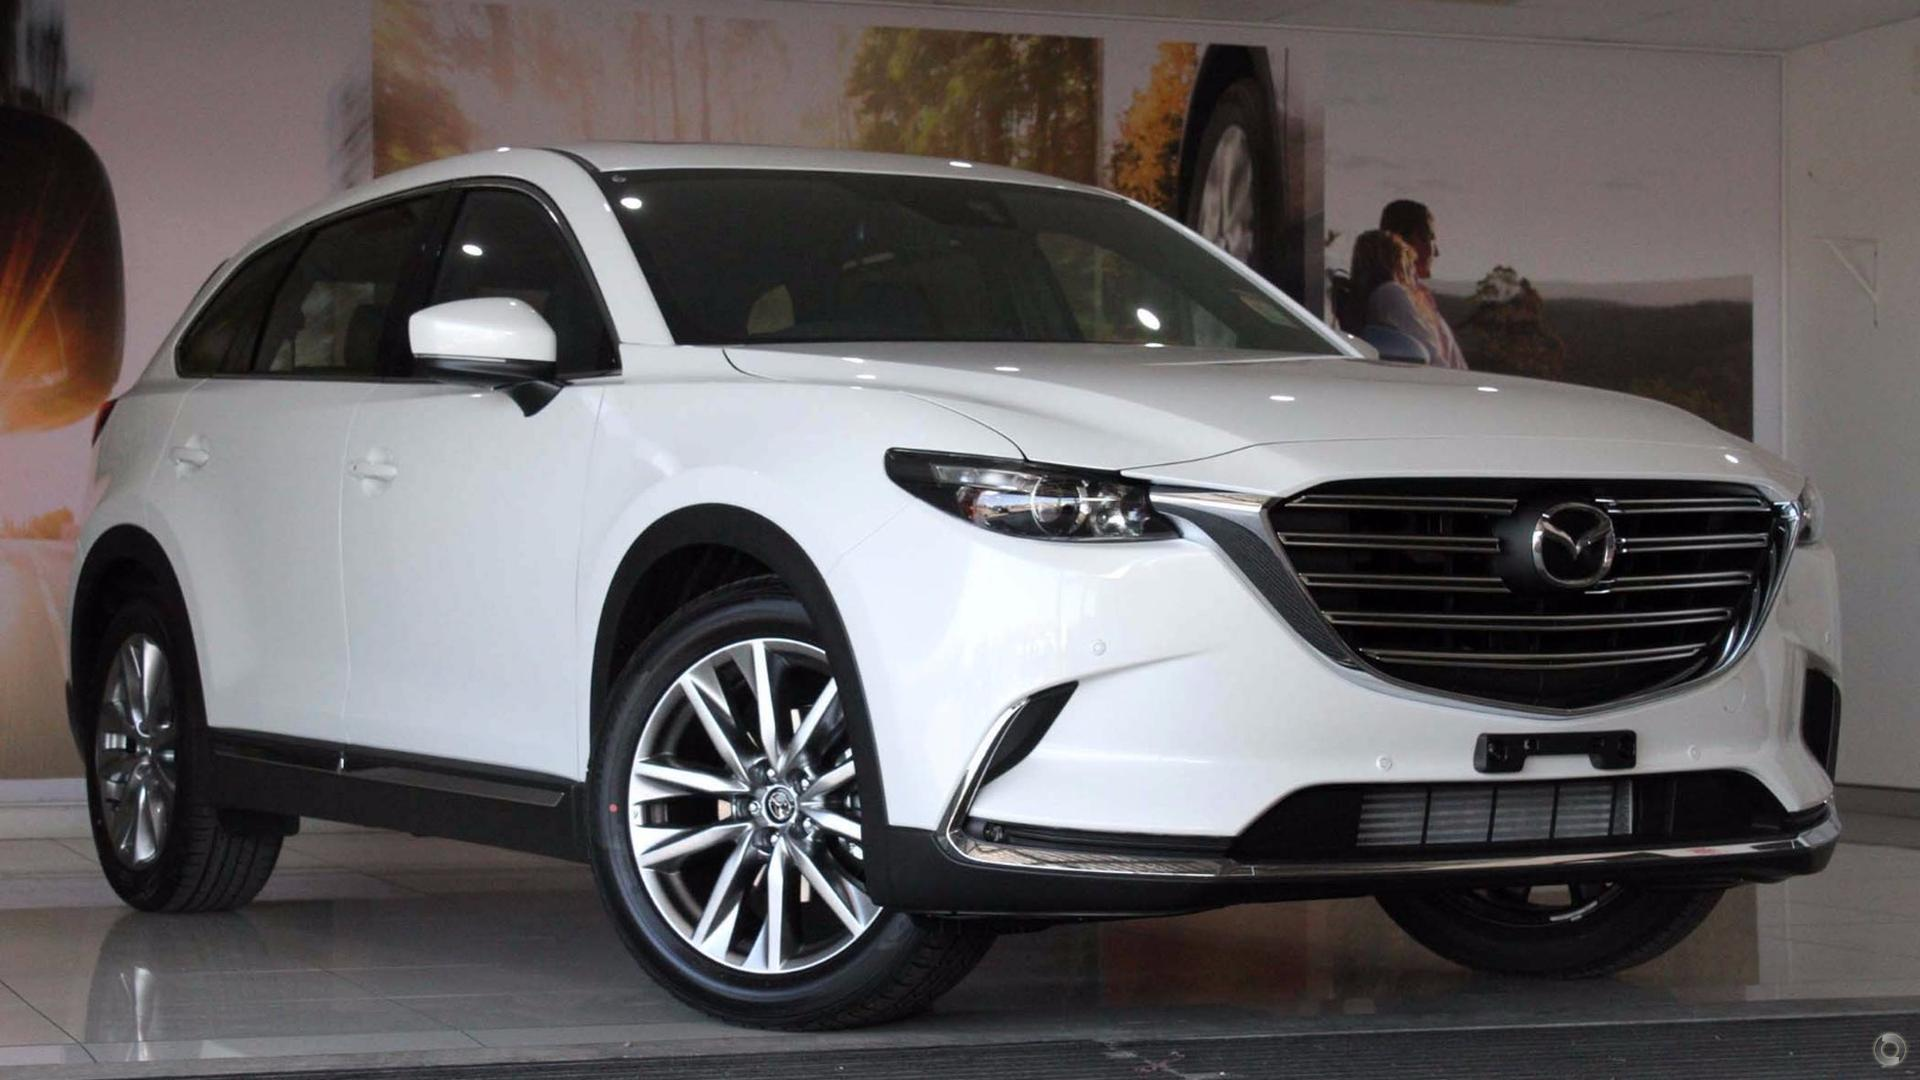 2019 Mazda Cx-9 TC